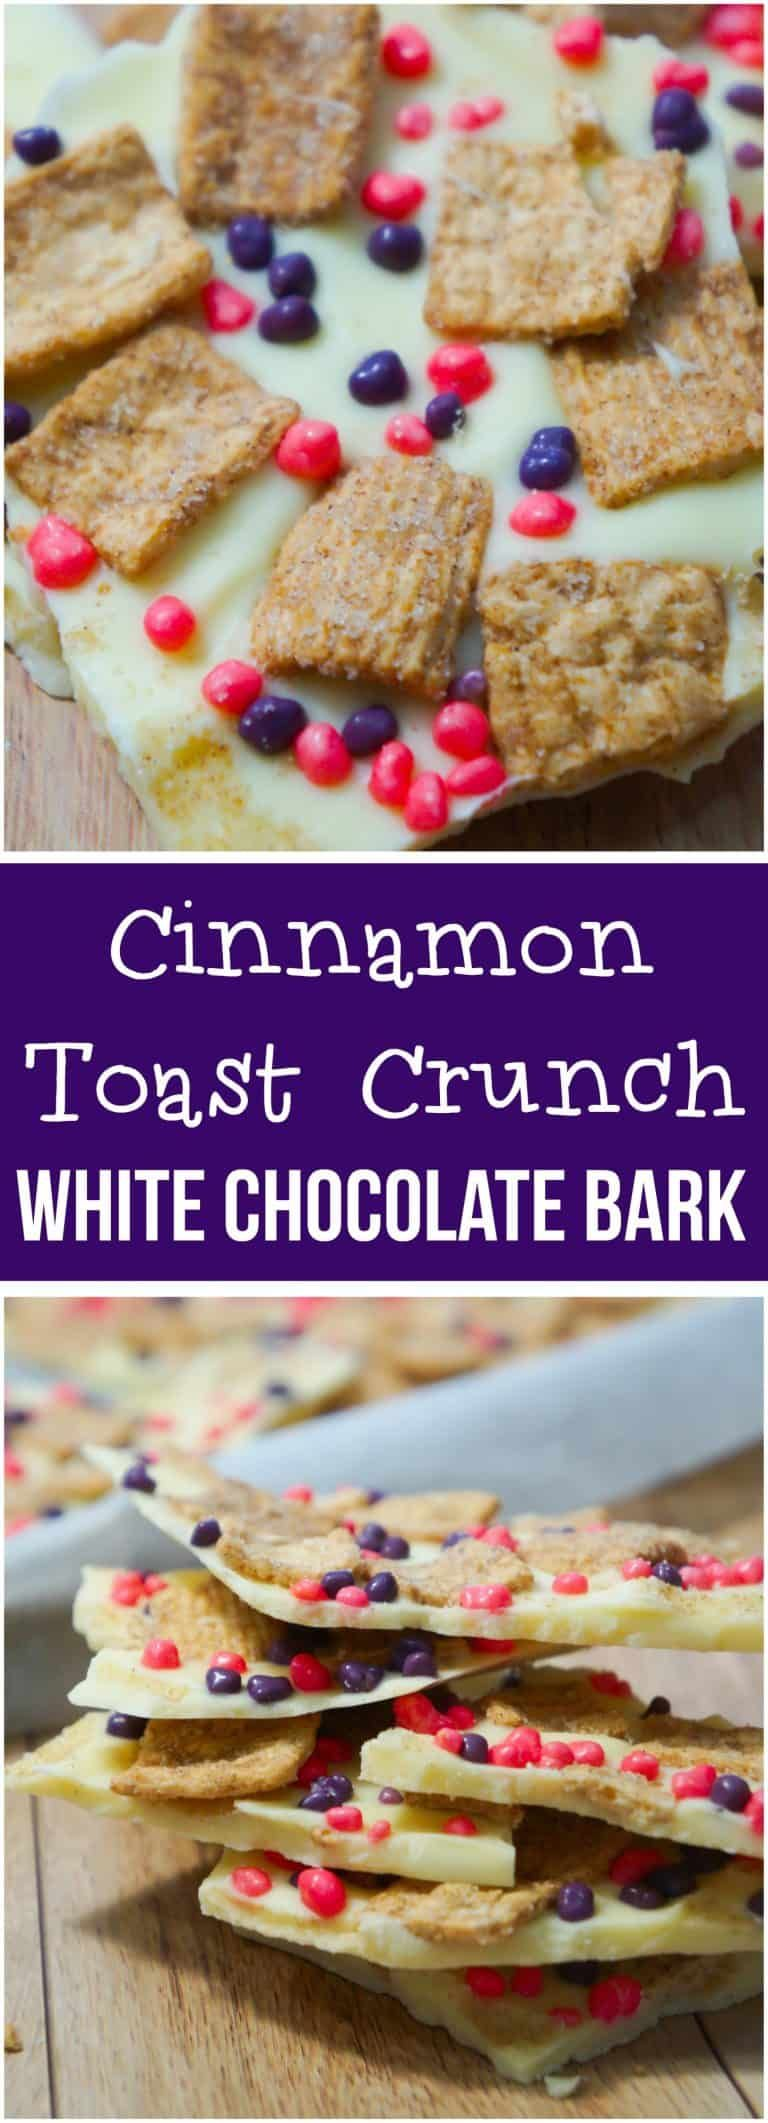 Cinnamon Toast Crunch White Chocolate Bark is an easy no bake dessert recipe. This bark is loaded with Cinnamon Toast Crunch cereal and Nerds candies. #cinnamontoastcrunch